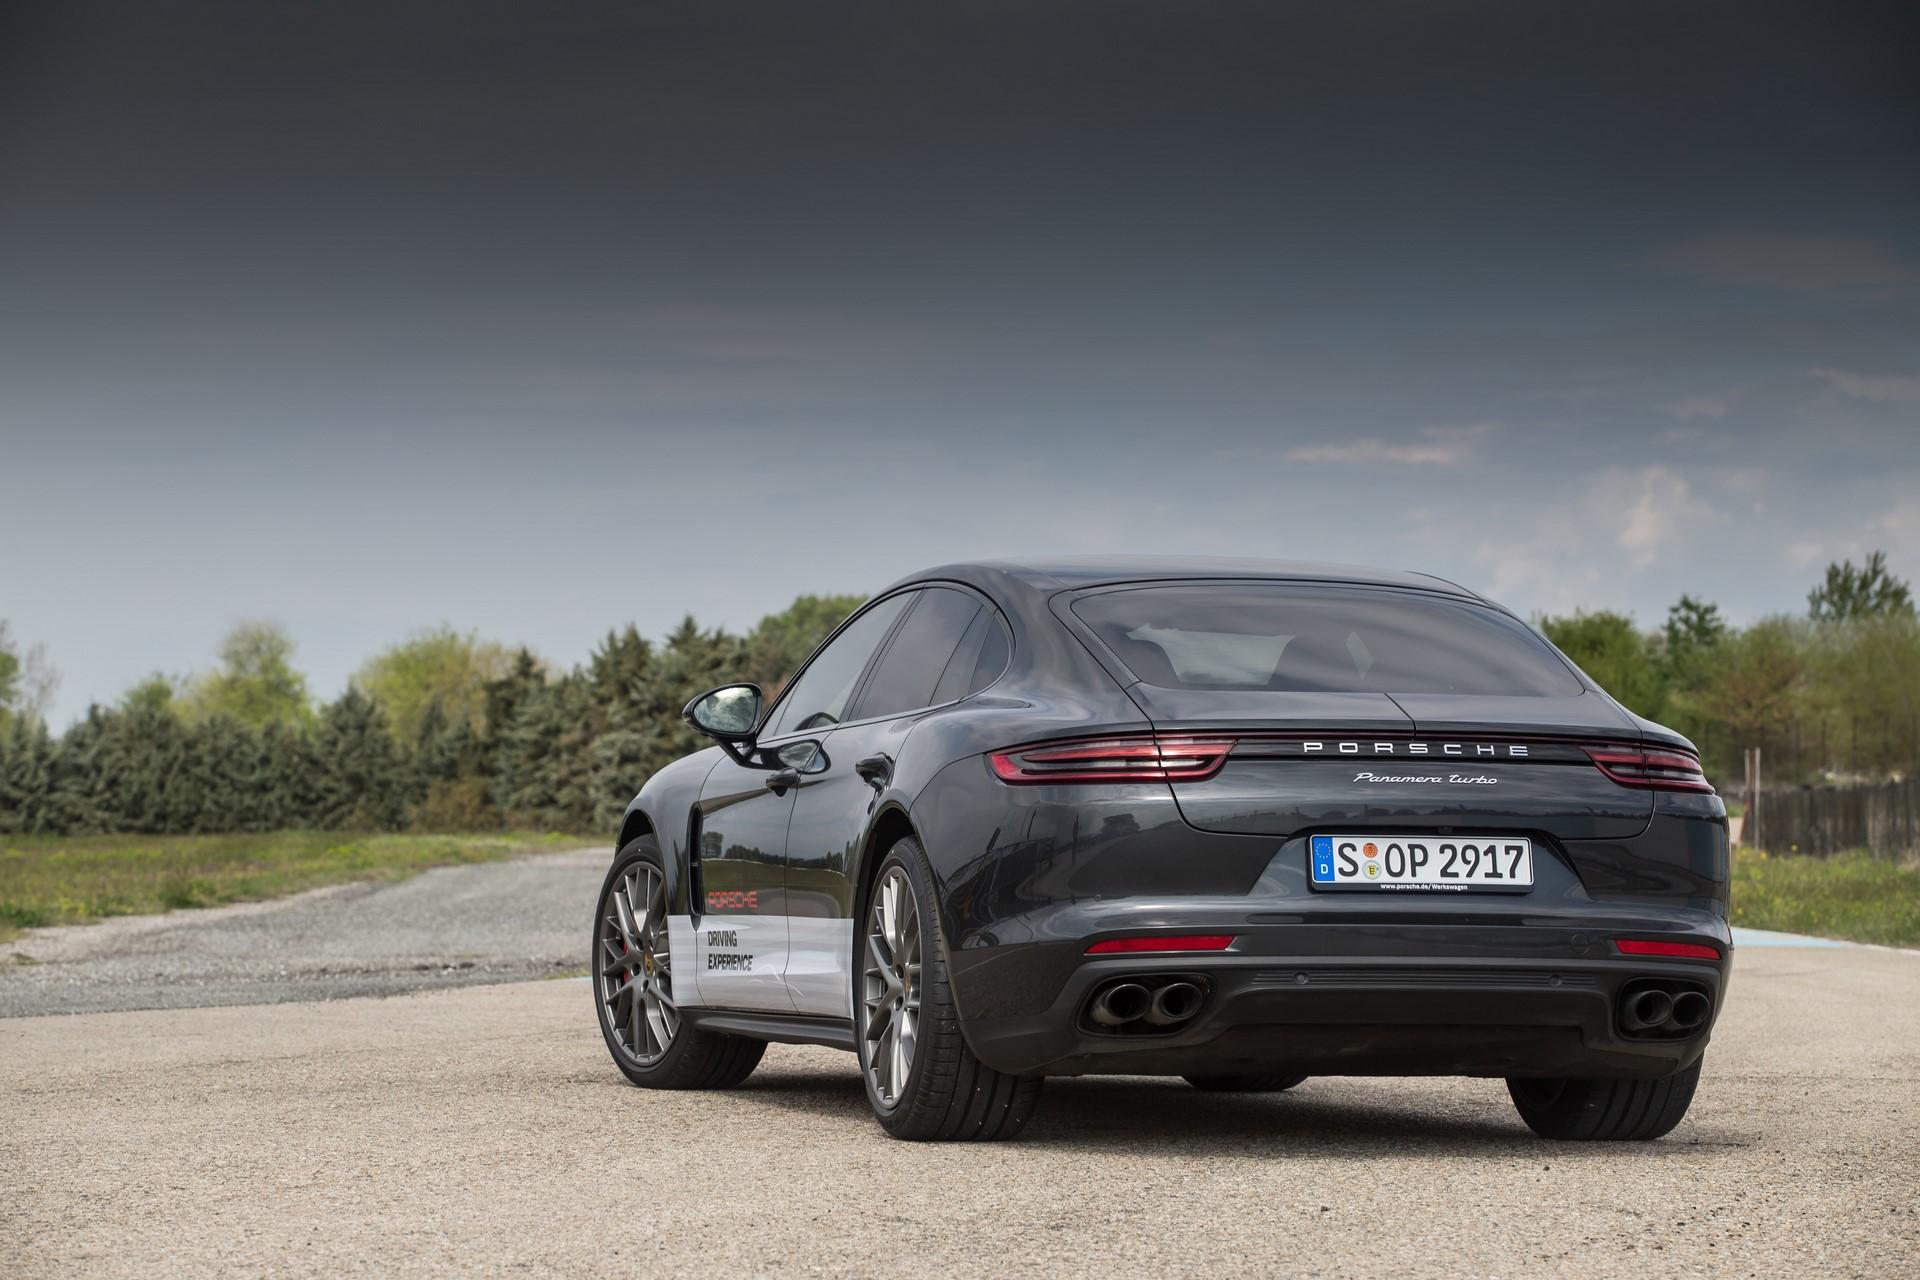 Porsche Driving Experience 2017 Serres (12)